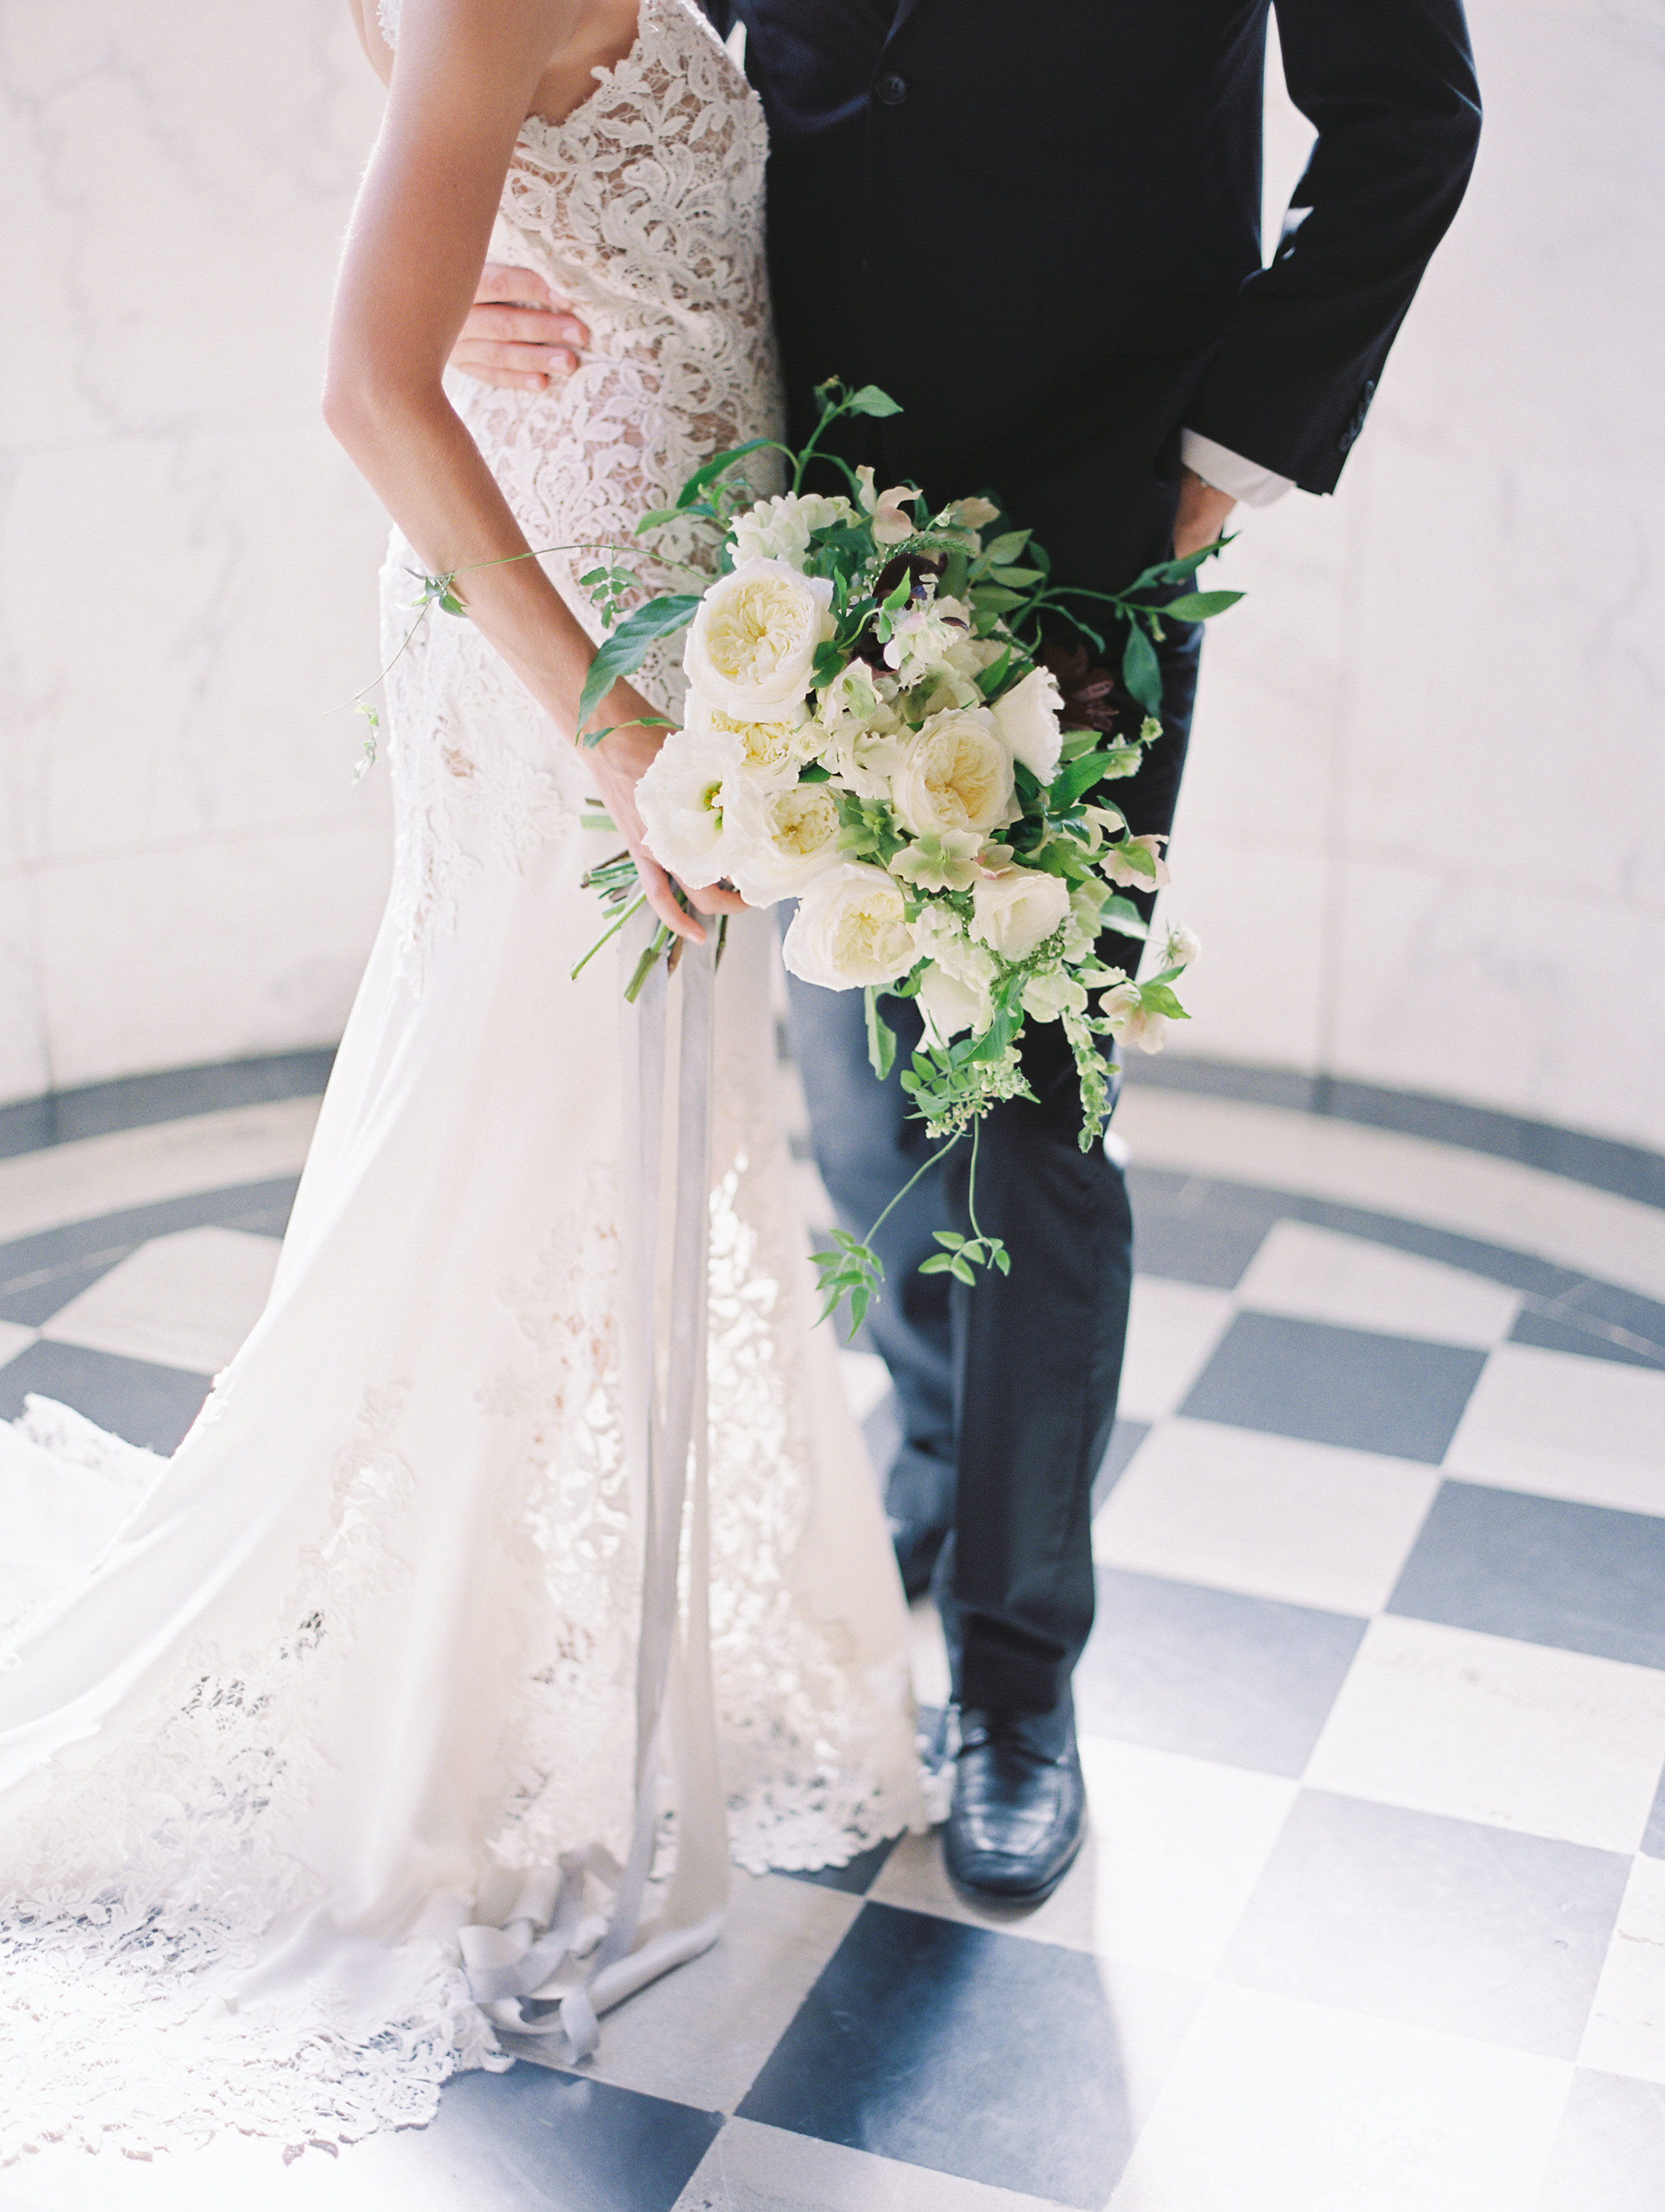 Vibiana-Wedding-Inspired-Shoot-62.jpg